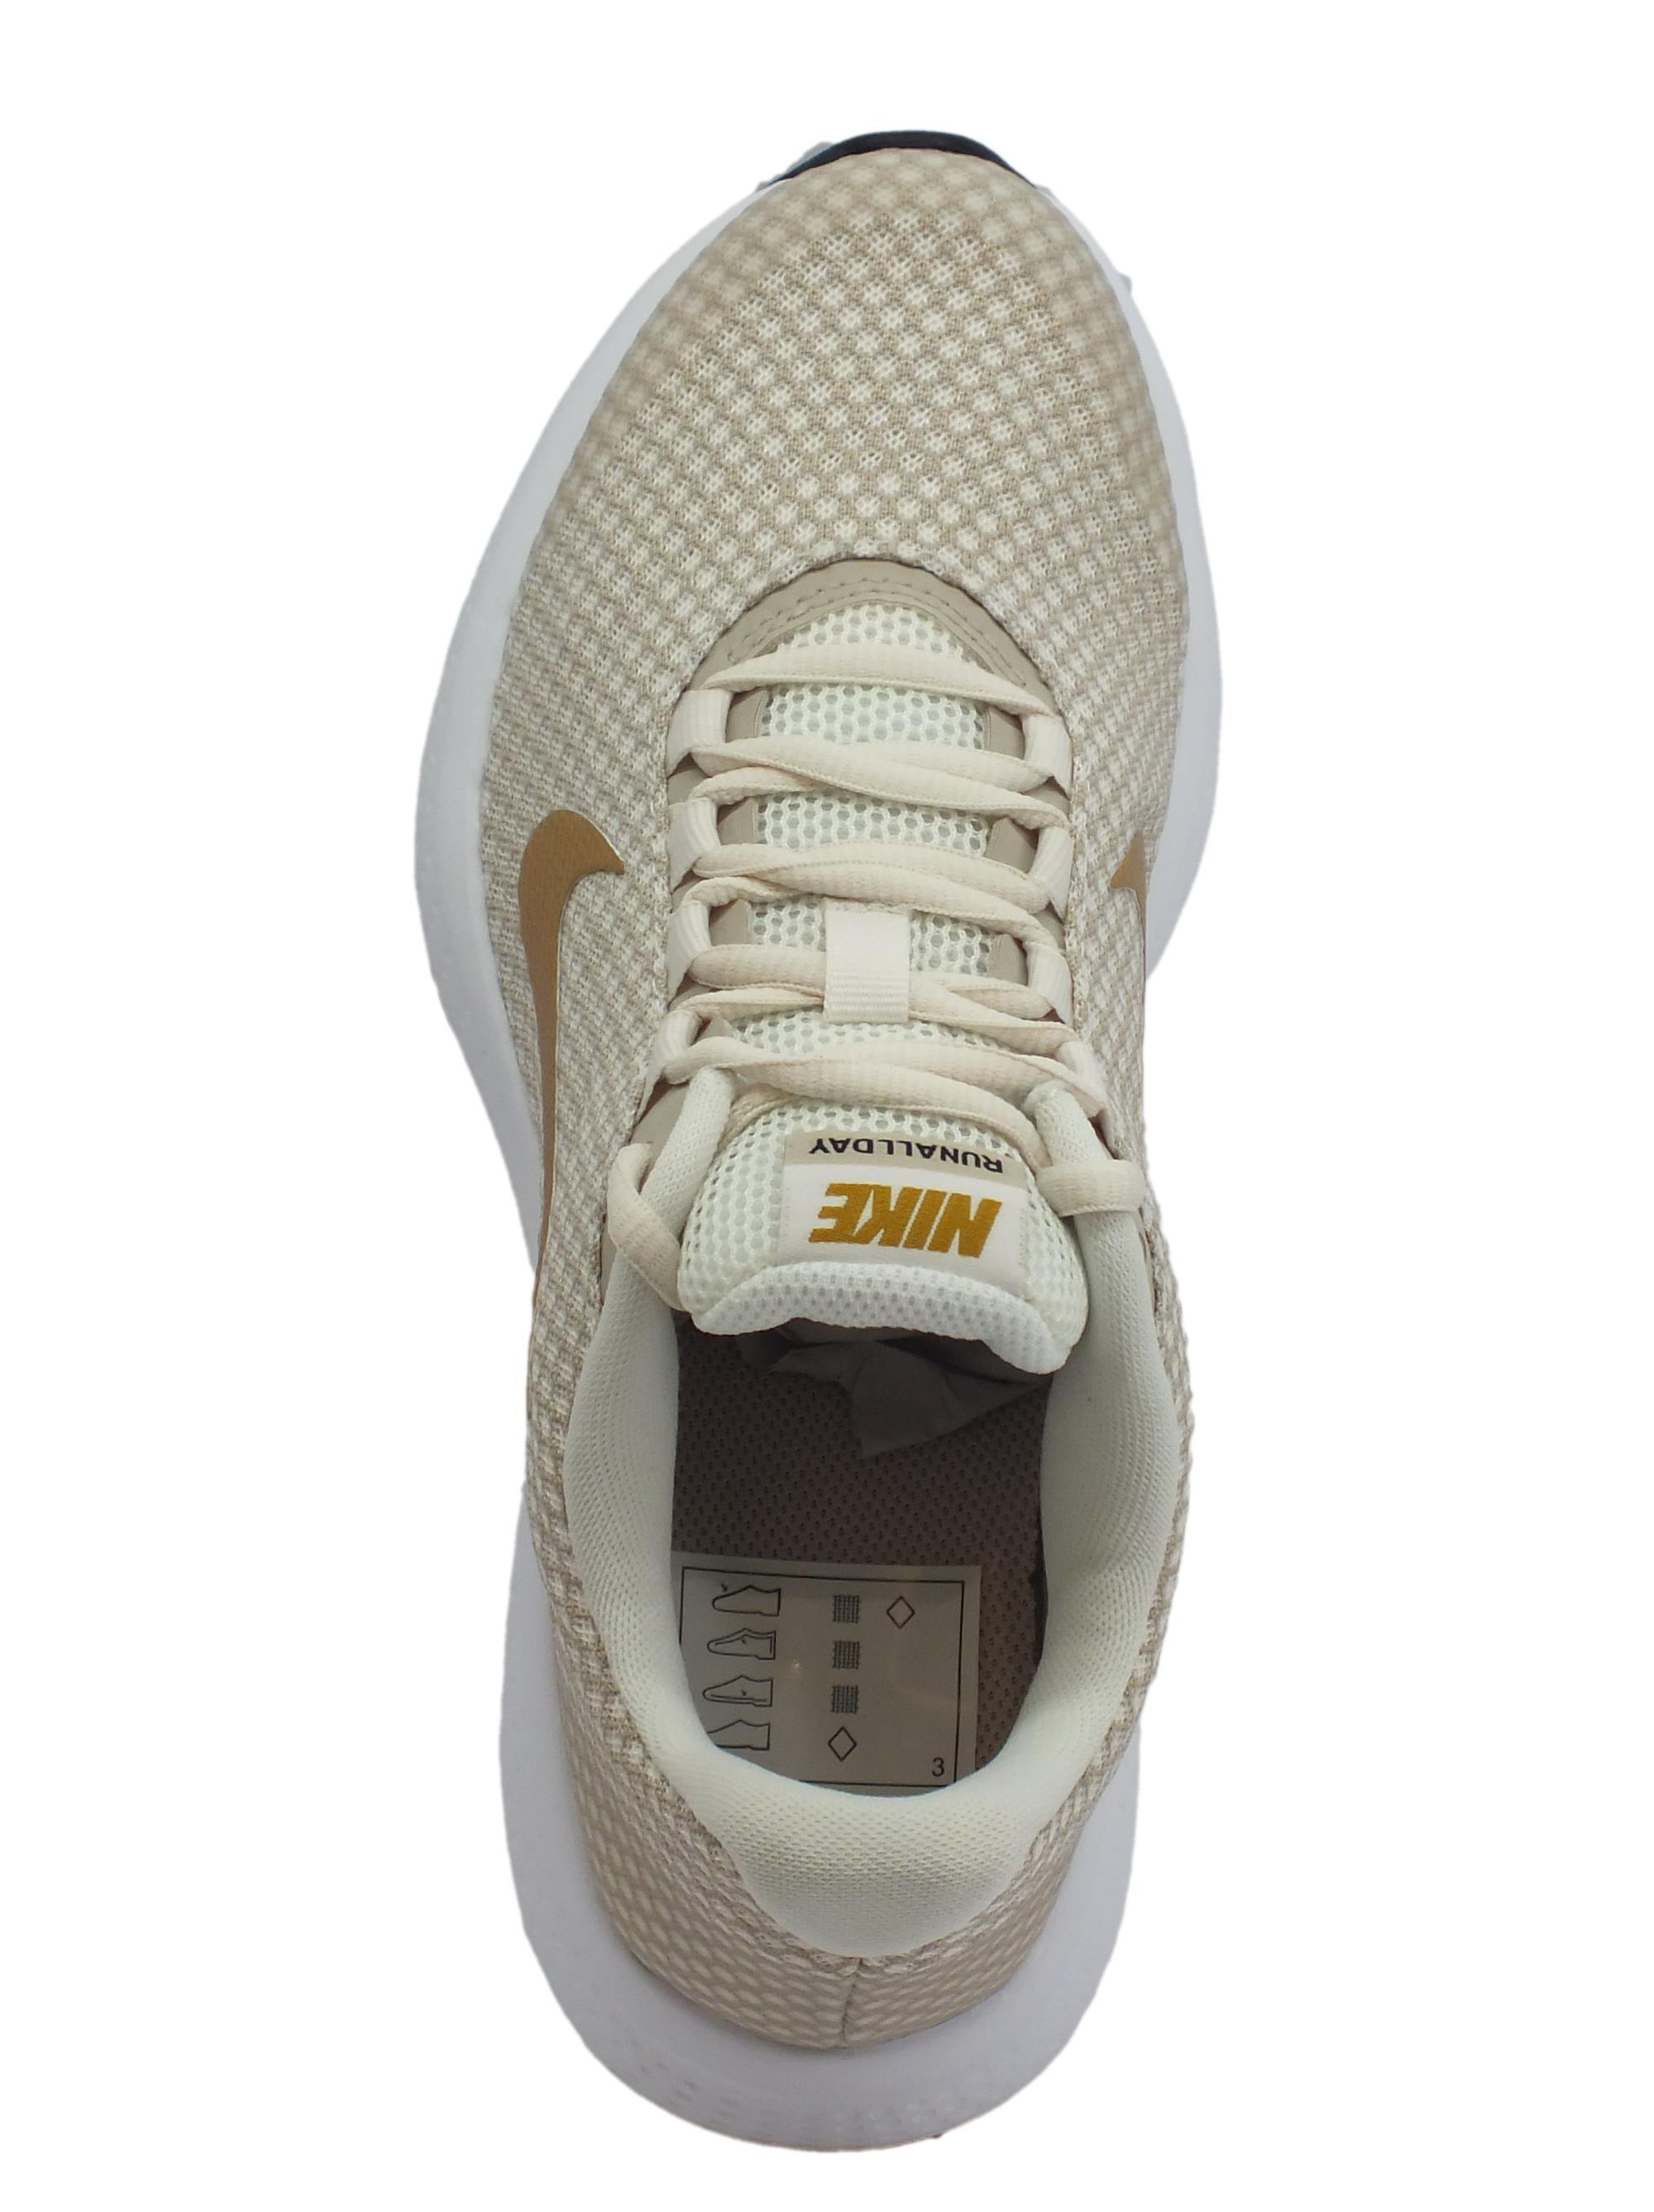 Scarpe sportive Nike Run All Day per donna in tessuto beige e metallico